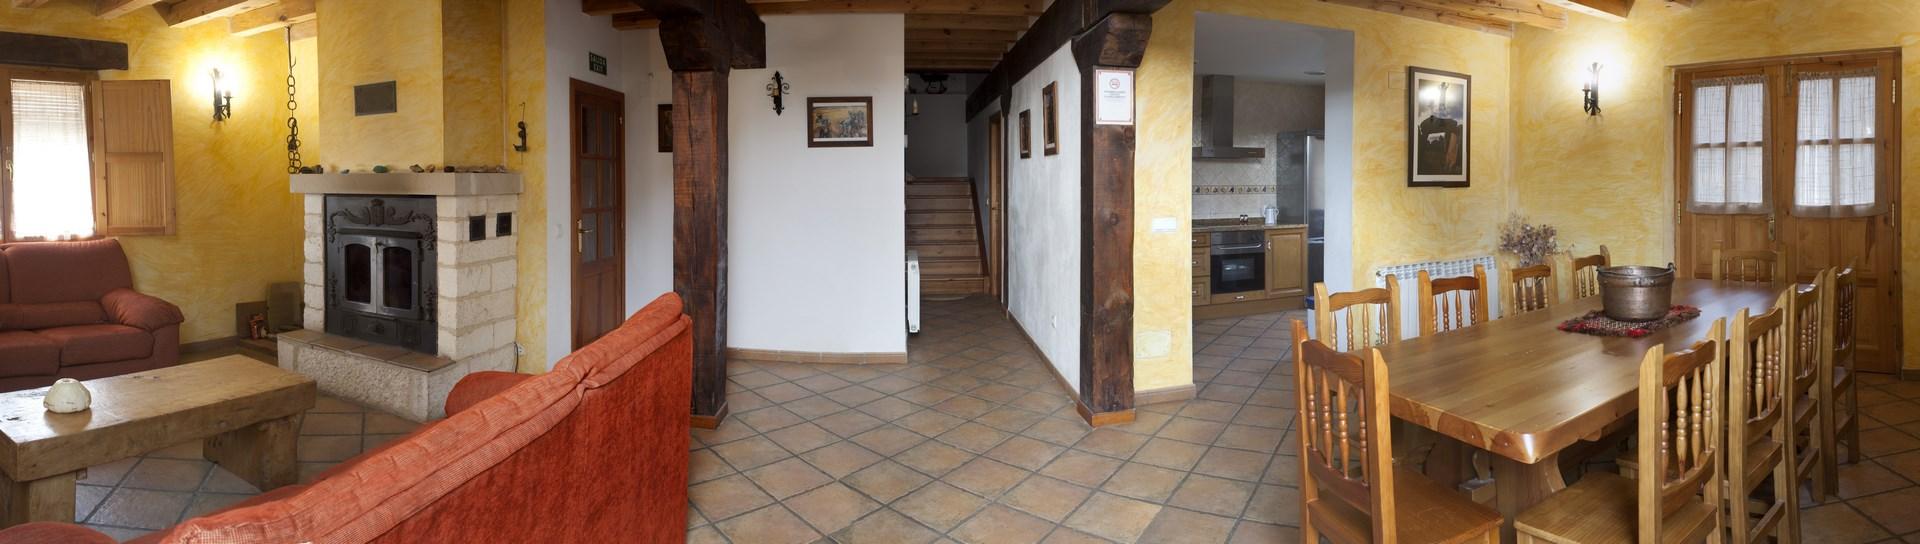 Salon comedor casa rural Roblejimeno